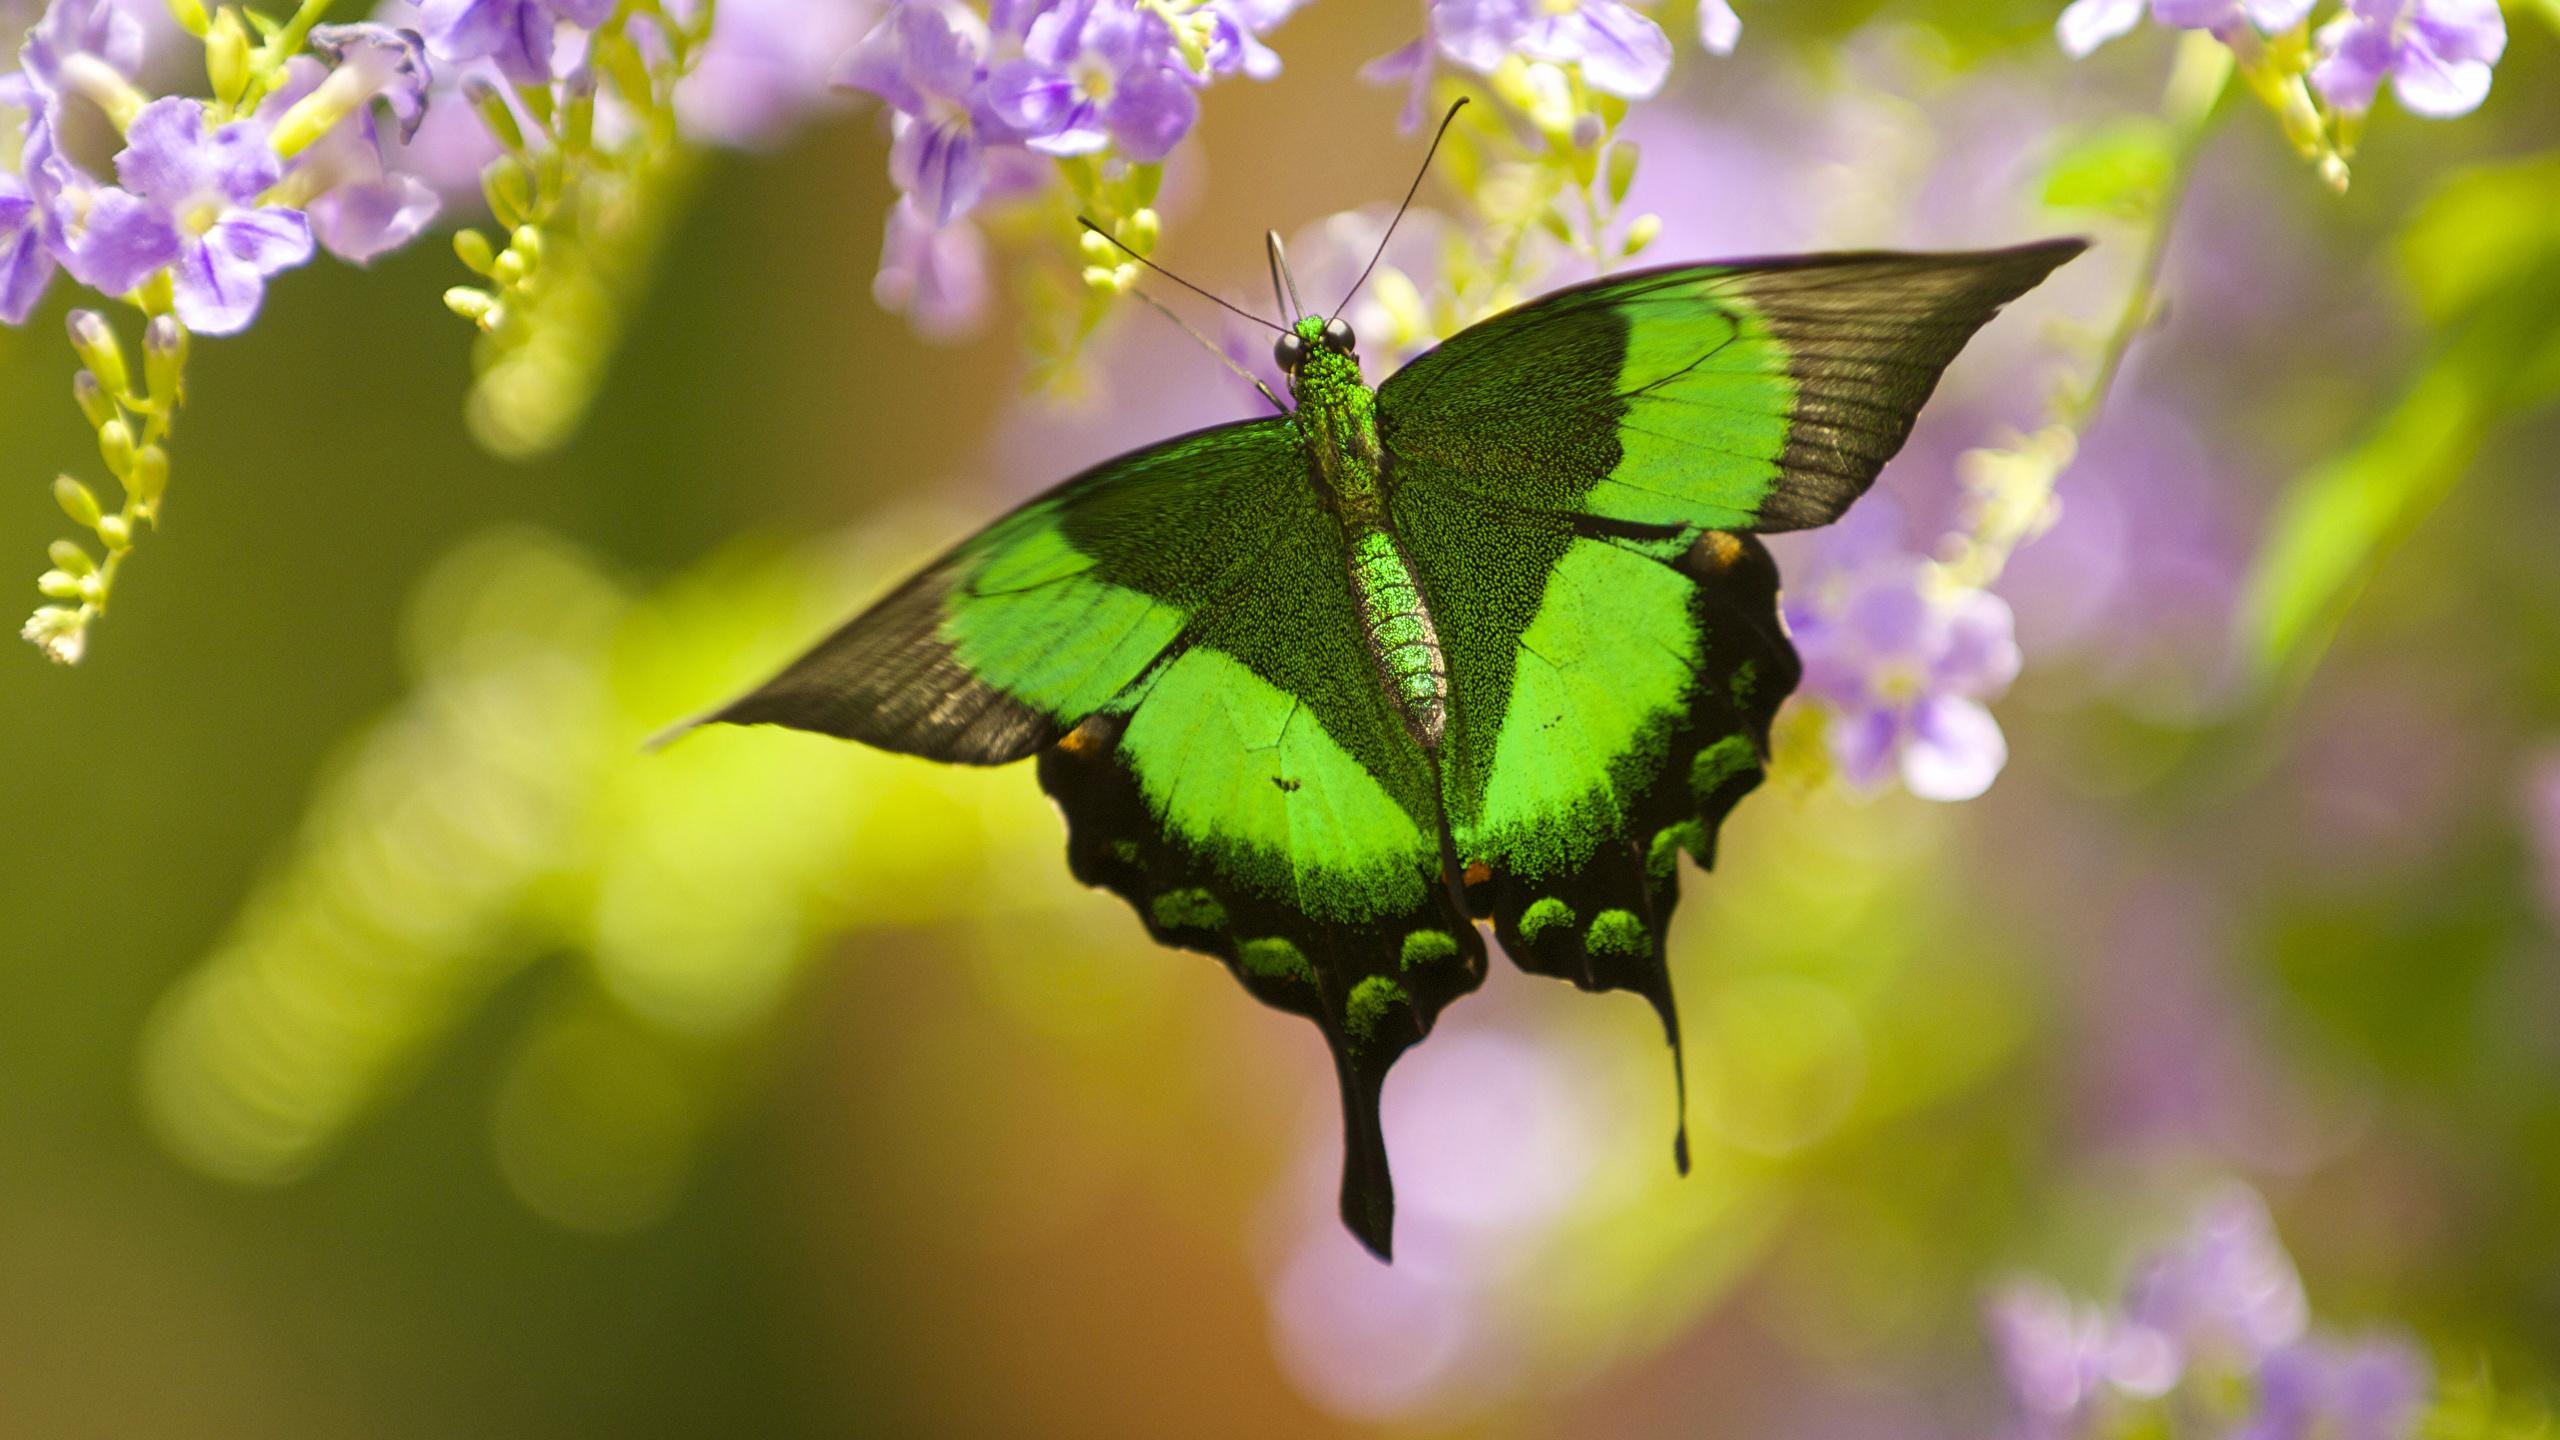 Картинка Бабочки Papilio palinurus Животные Крупным планом 2560x1440 бабочка вблизи животное